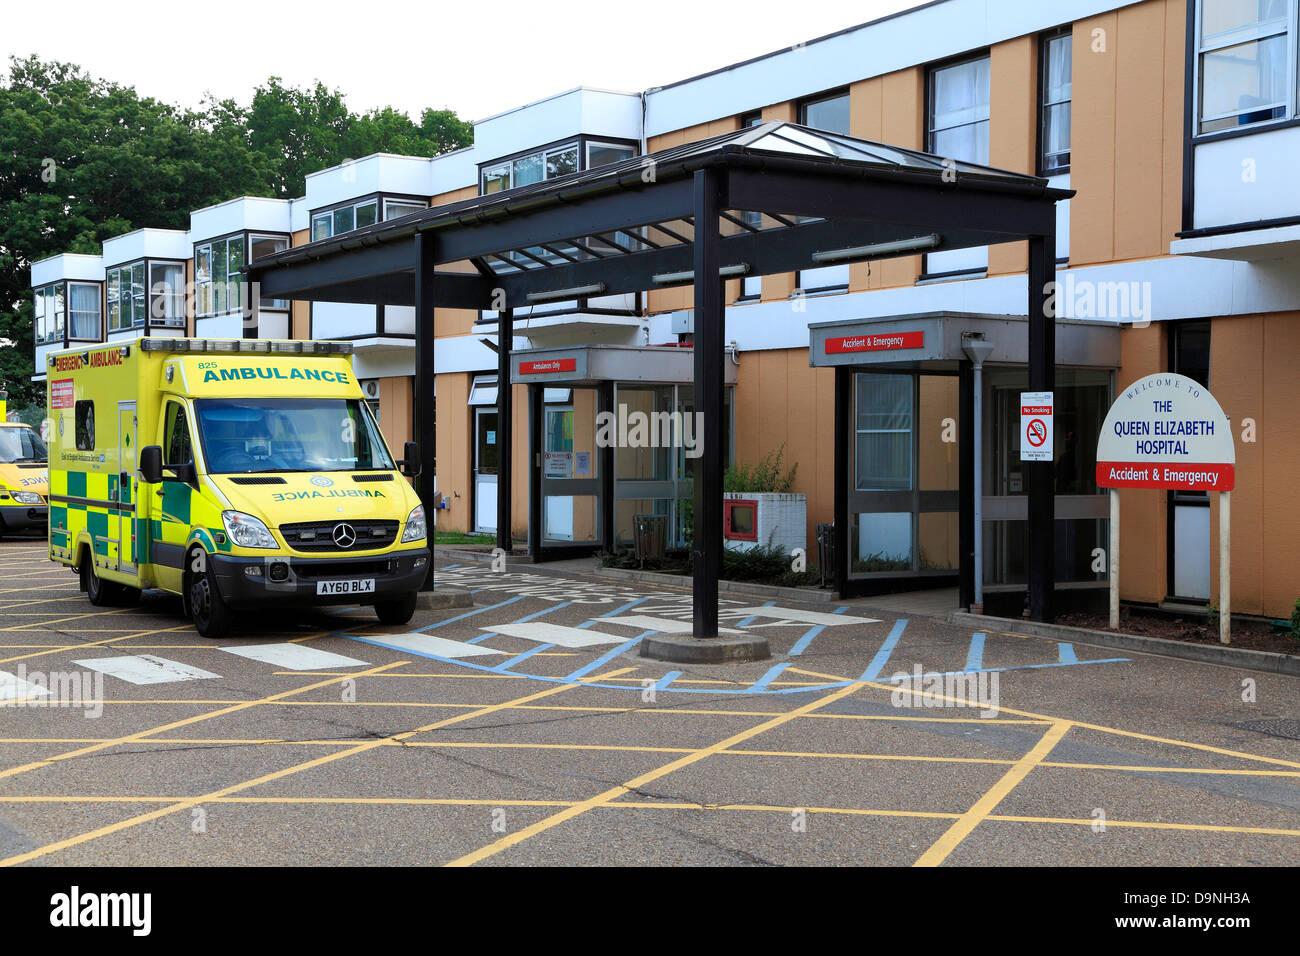 Kings Lynn, Queen Elizabeth Hospital, NHS, Norfolk, England, UK, English hospitals, ambulance National Health Service - Stock Image